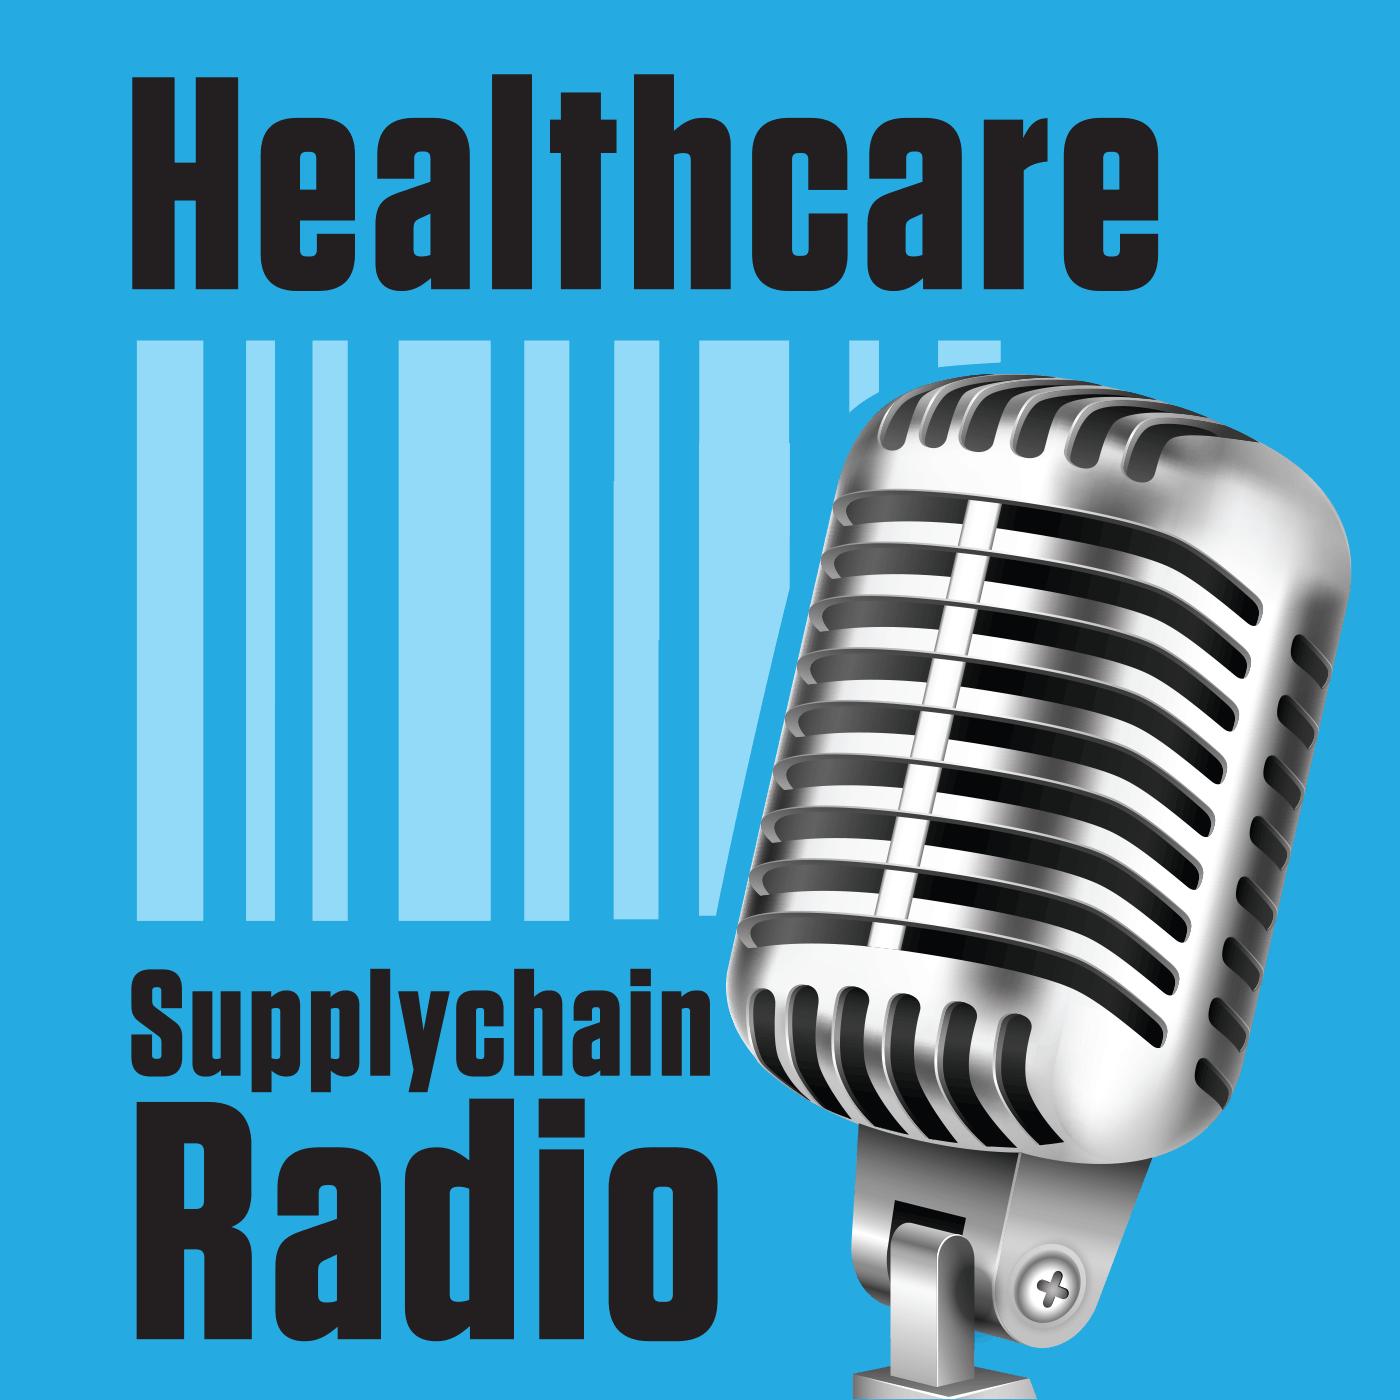 Healthcare Supply Chain Radio with John Pritchard show art